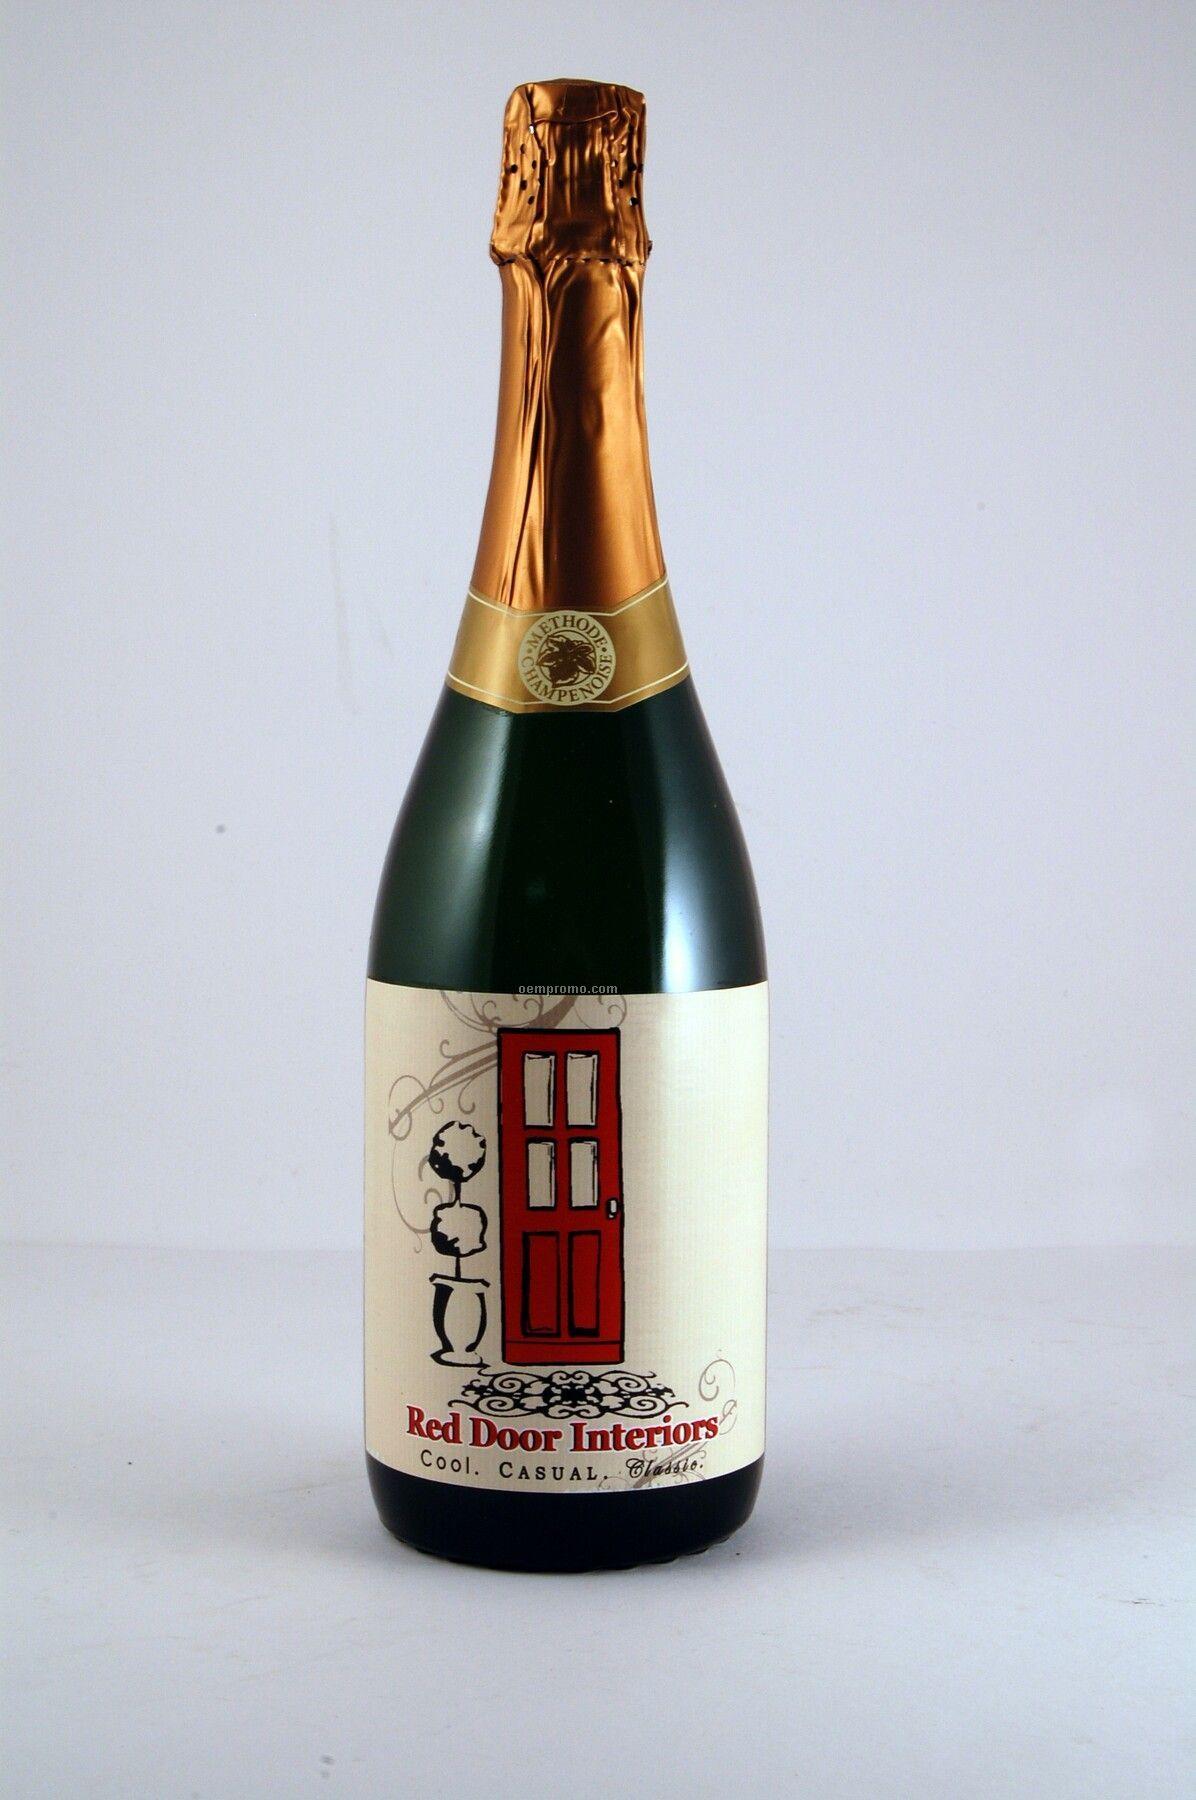 2007 Wv Blanc De Noirs, Carneros Platinum Series (Custom Labeled Wine)